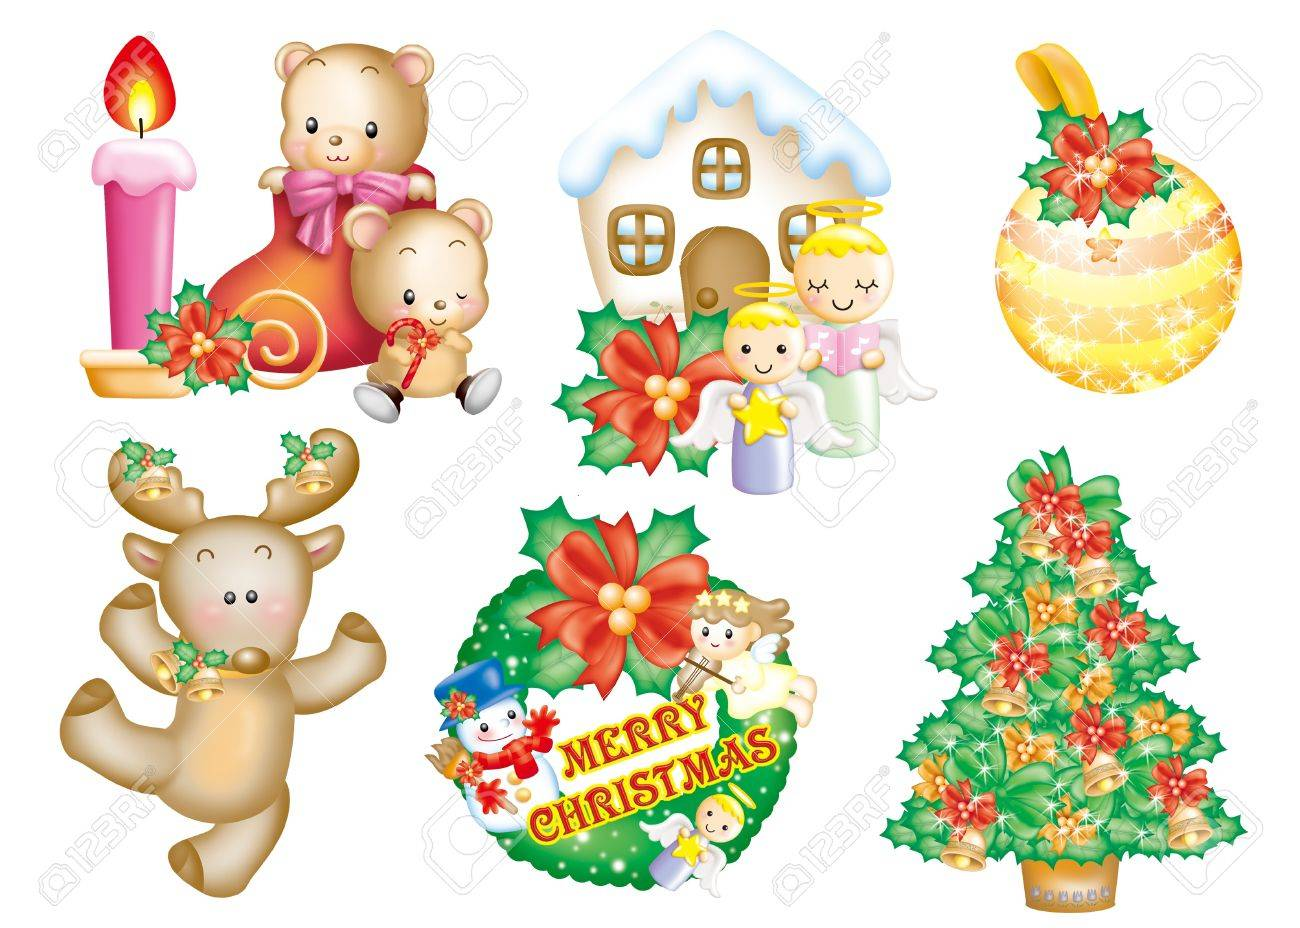 Cute cartoon design elements set - Christmas Stock Photo - 9530416